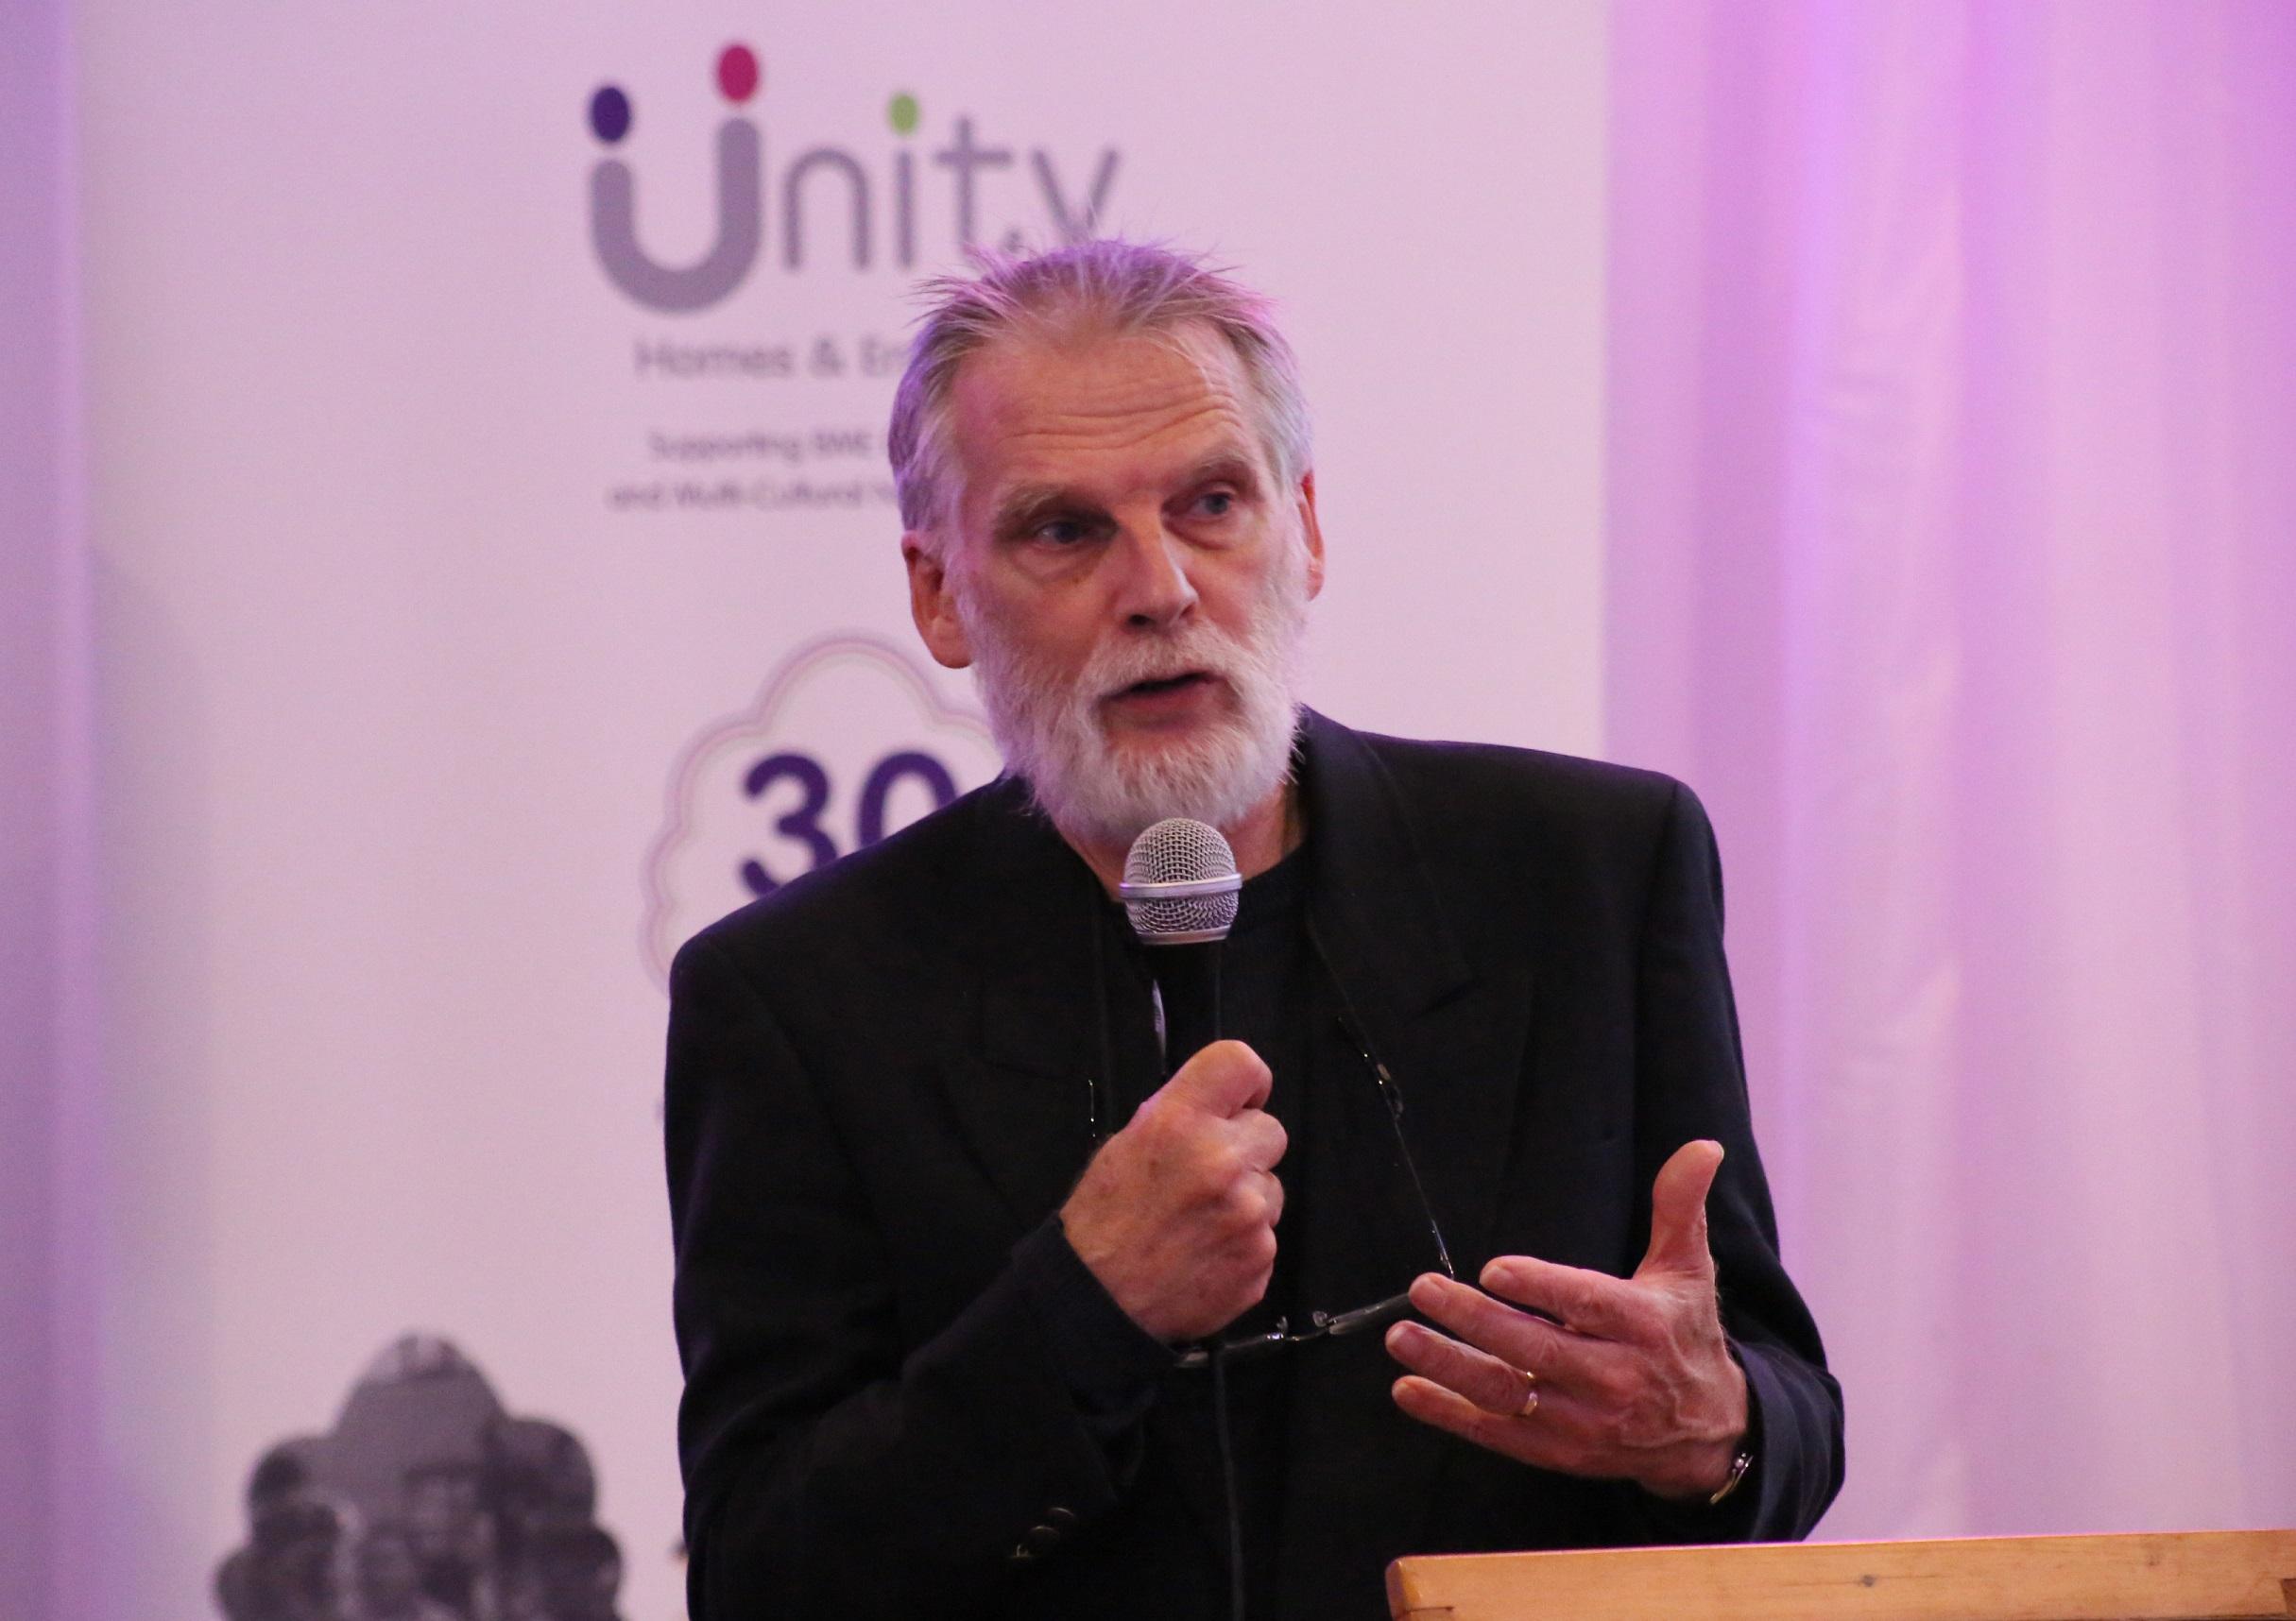 Chapeltown Cohousing Chair Bill Phelps